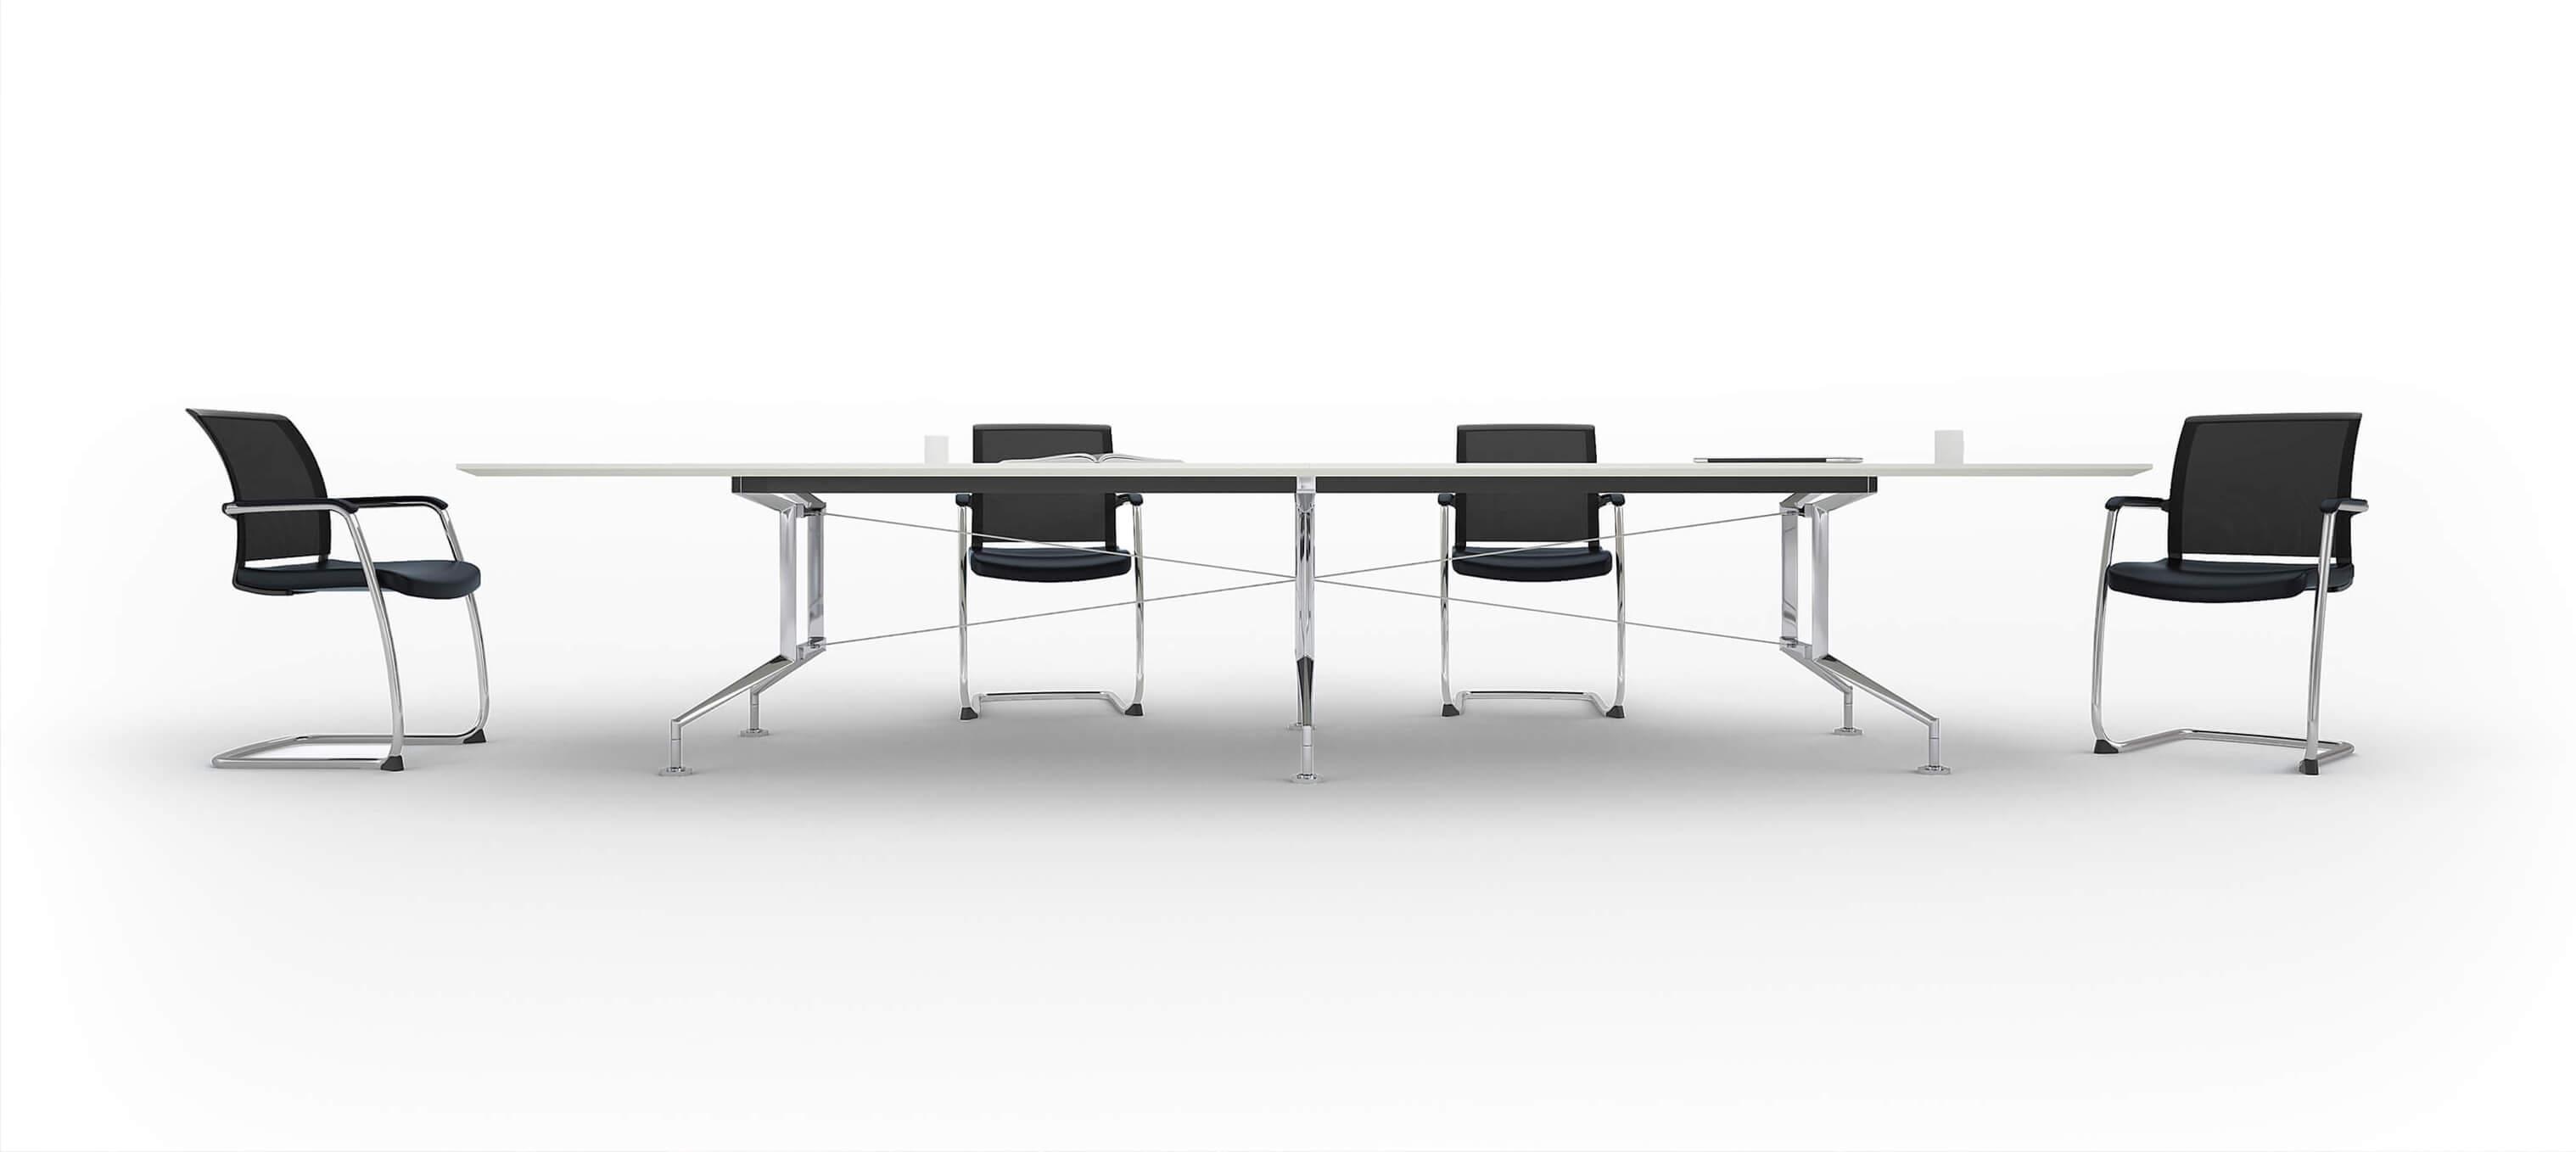 Forum Board Room Chairs White Hero